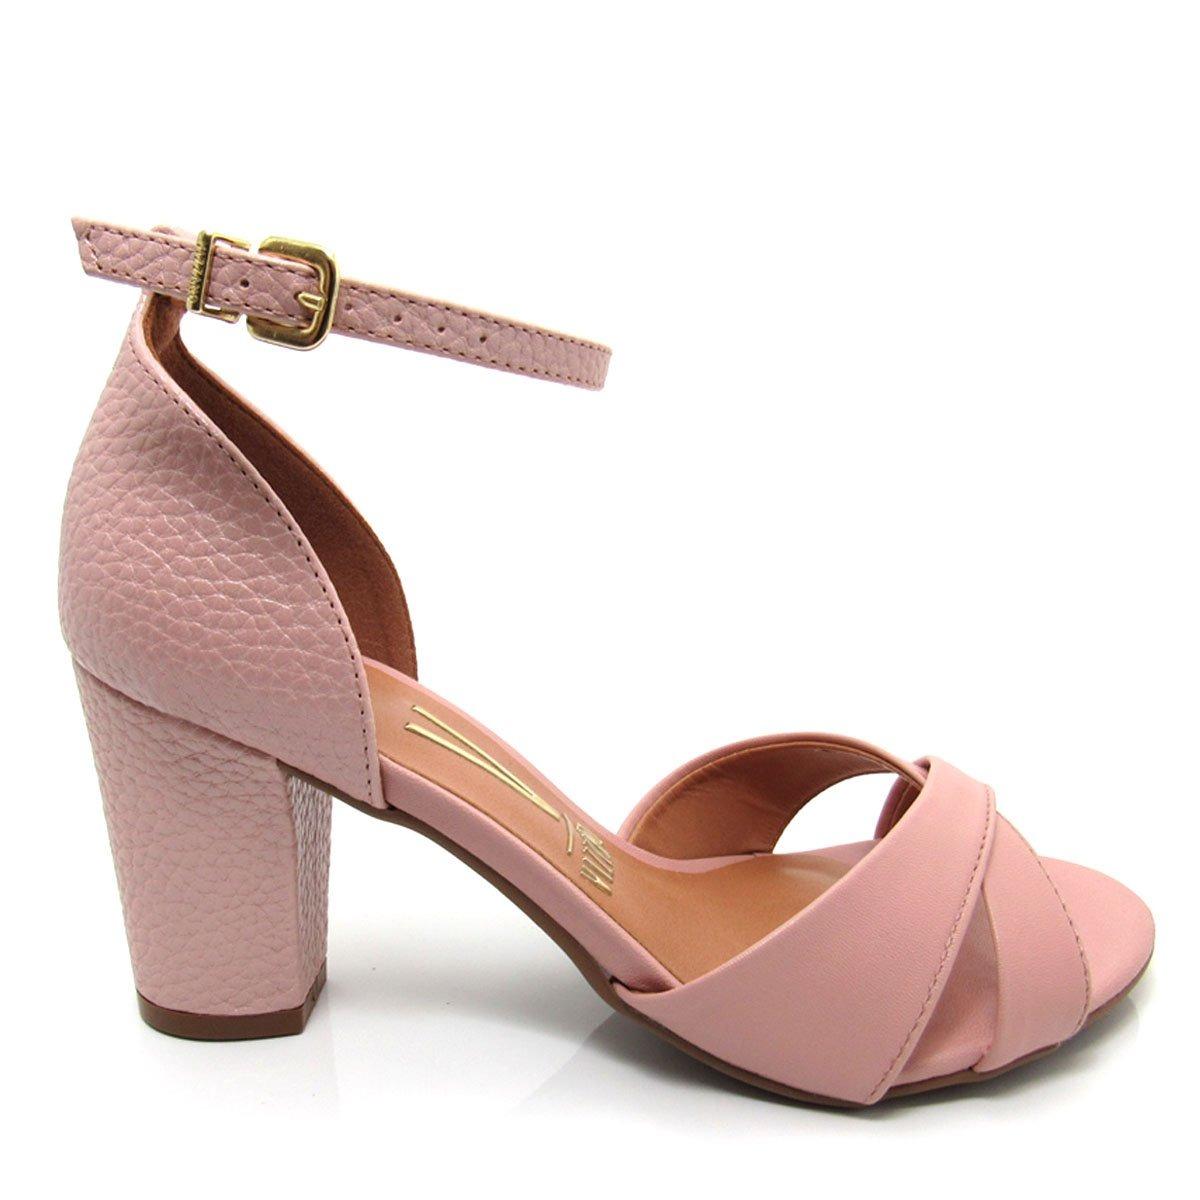 c46fe3f3f sandália feminina salto grosso vizzano 6262250 rosa. Carregando zoom.